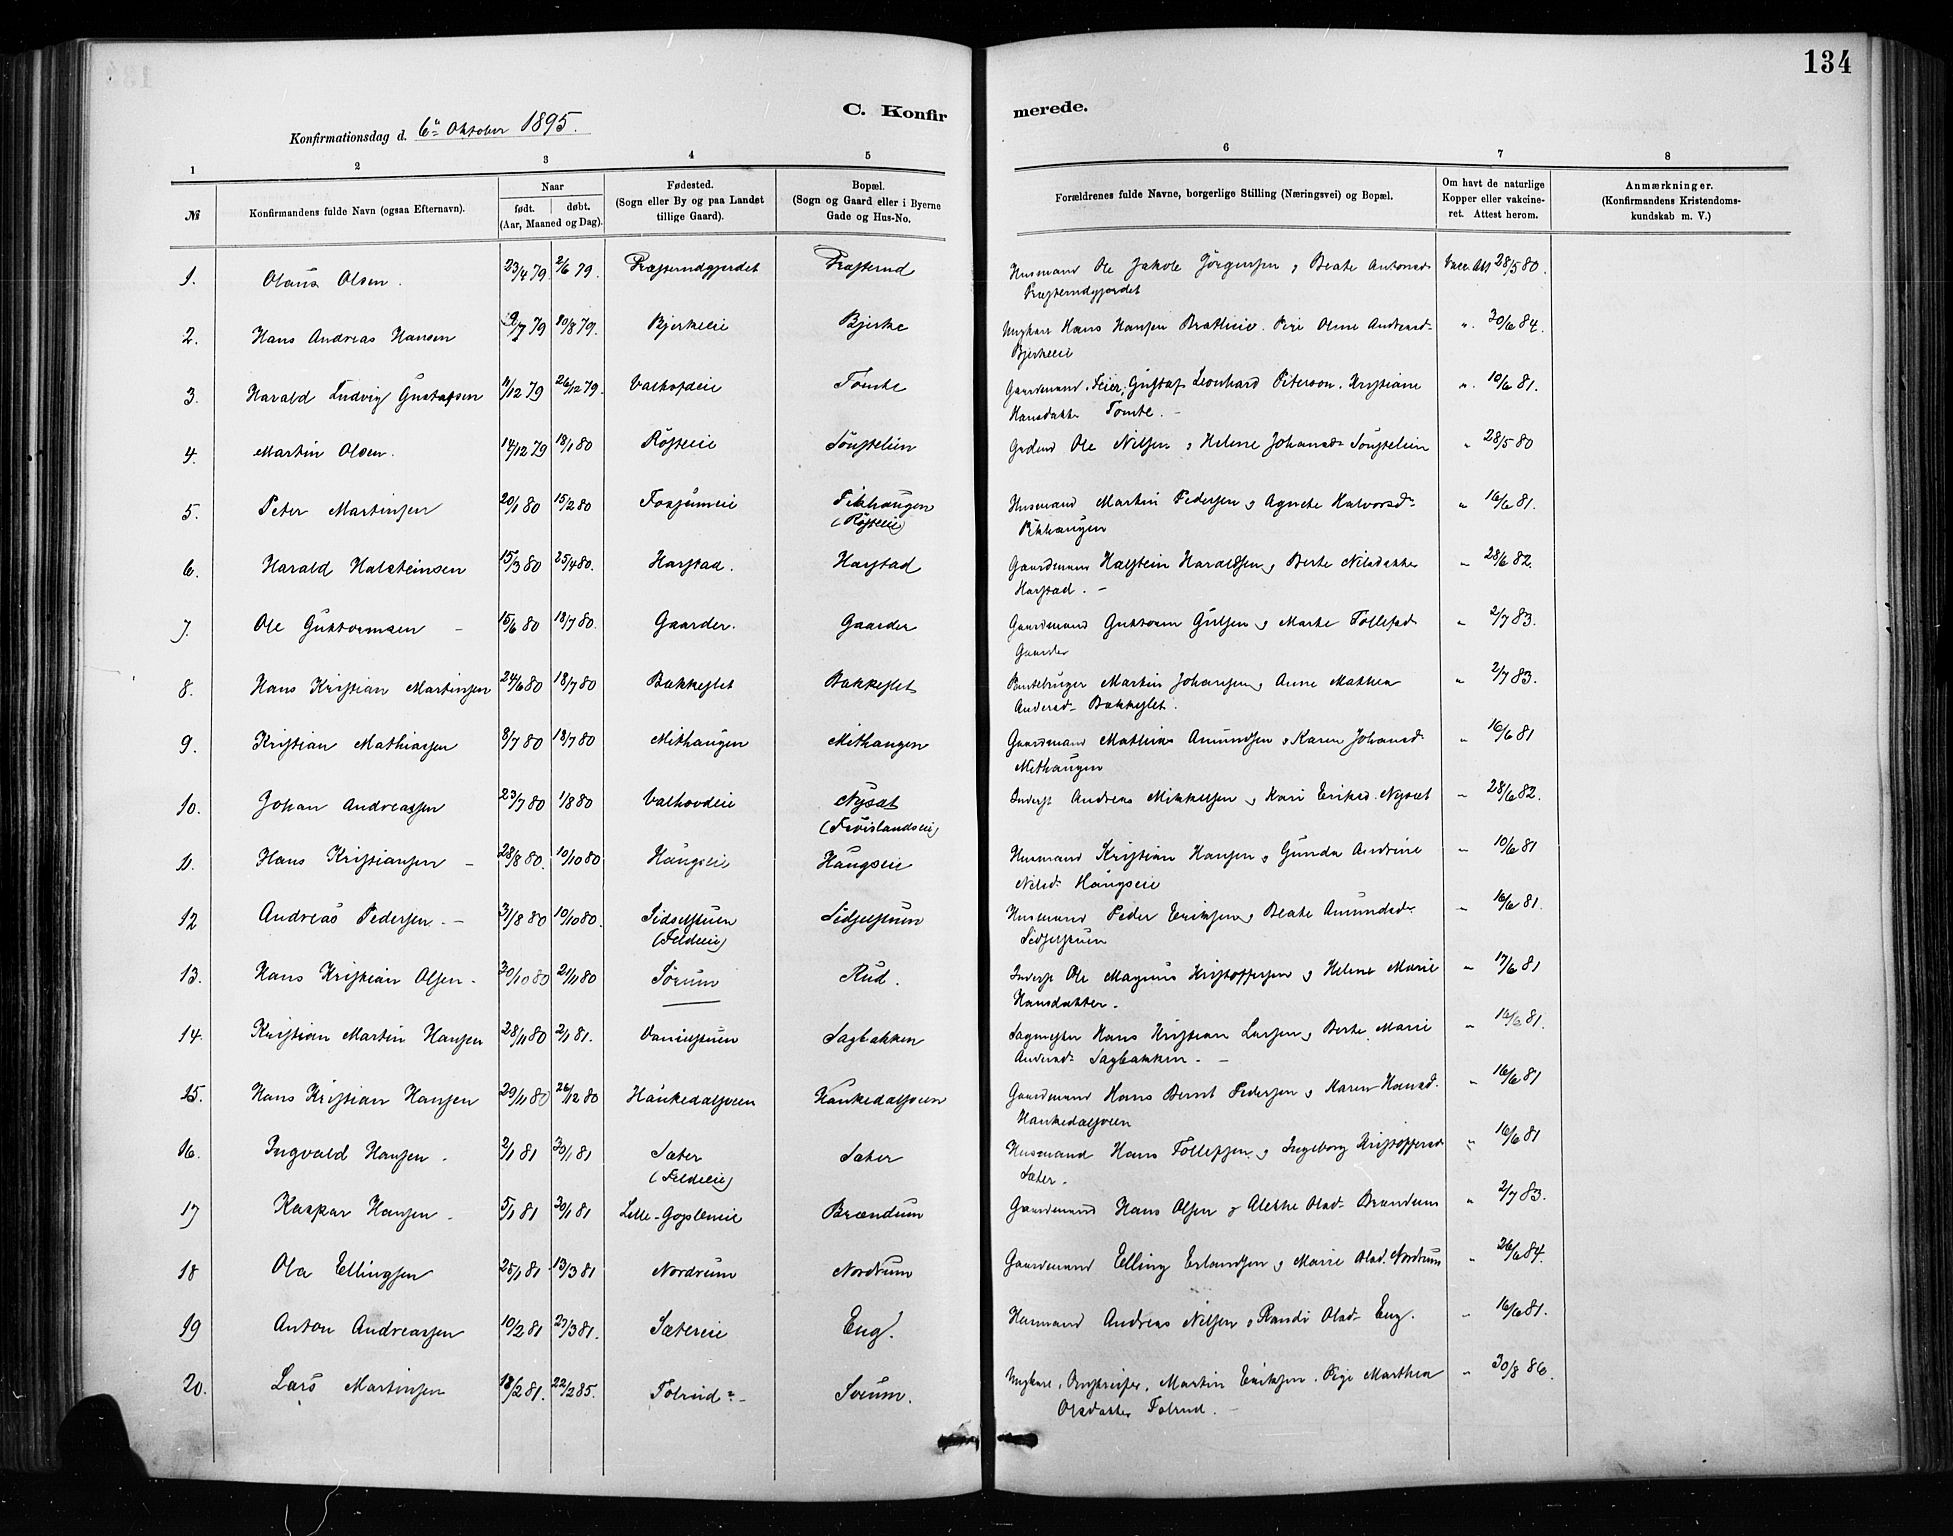 SAH, Nordre Land prestekontor, Ministerialbok nr. 4, 1882-1896, s. 134